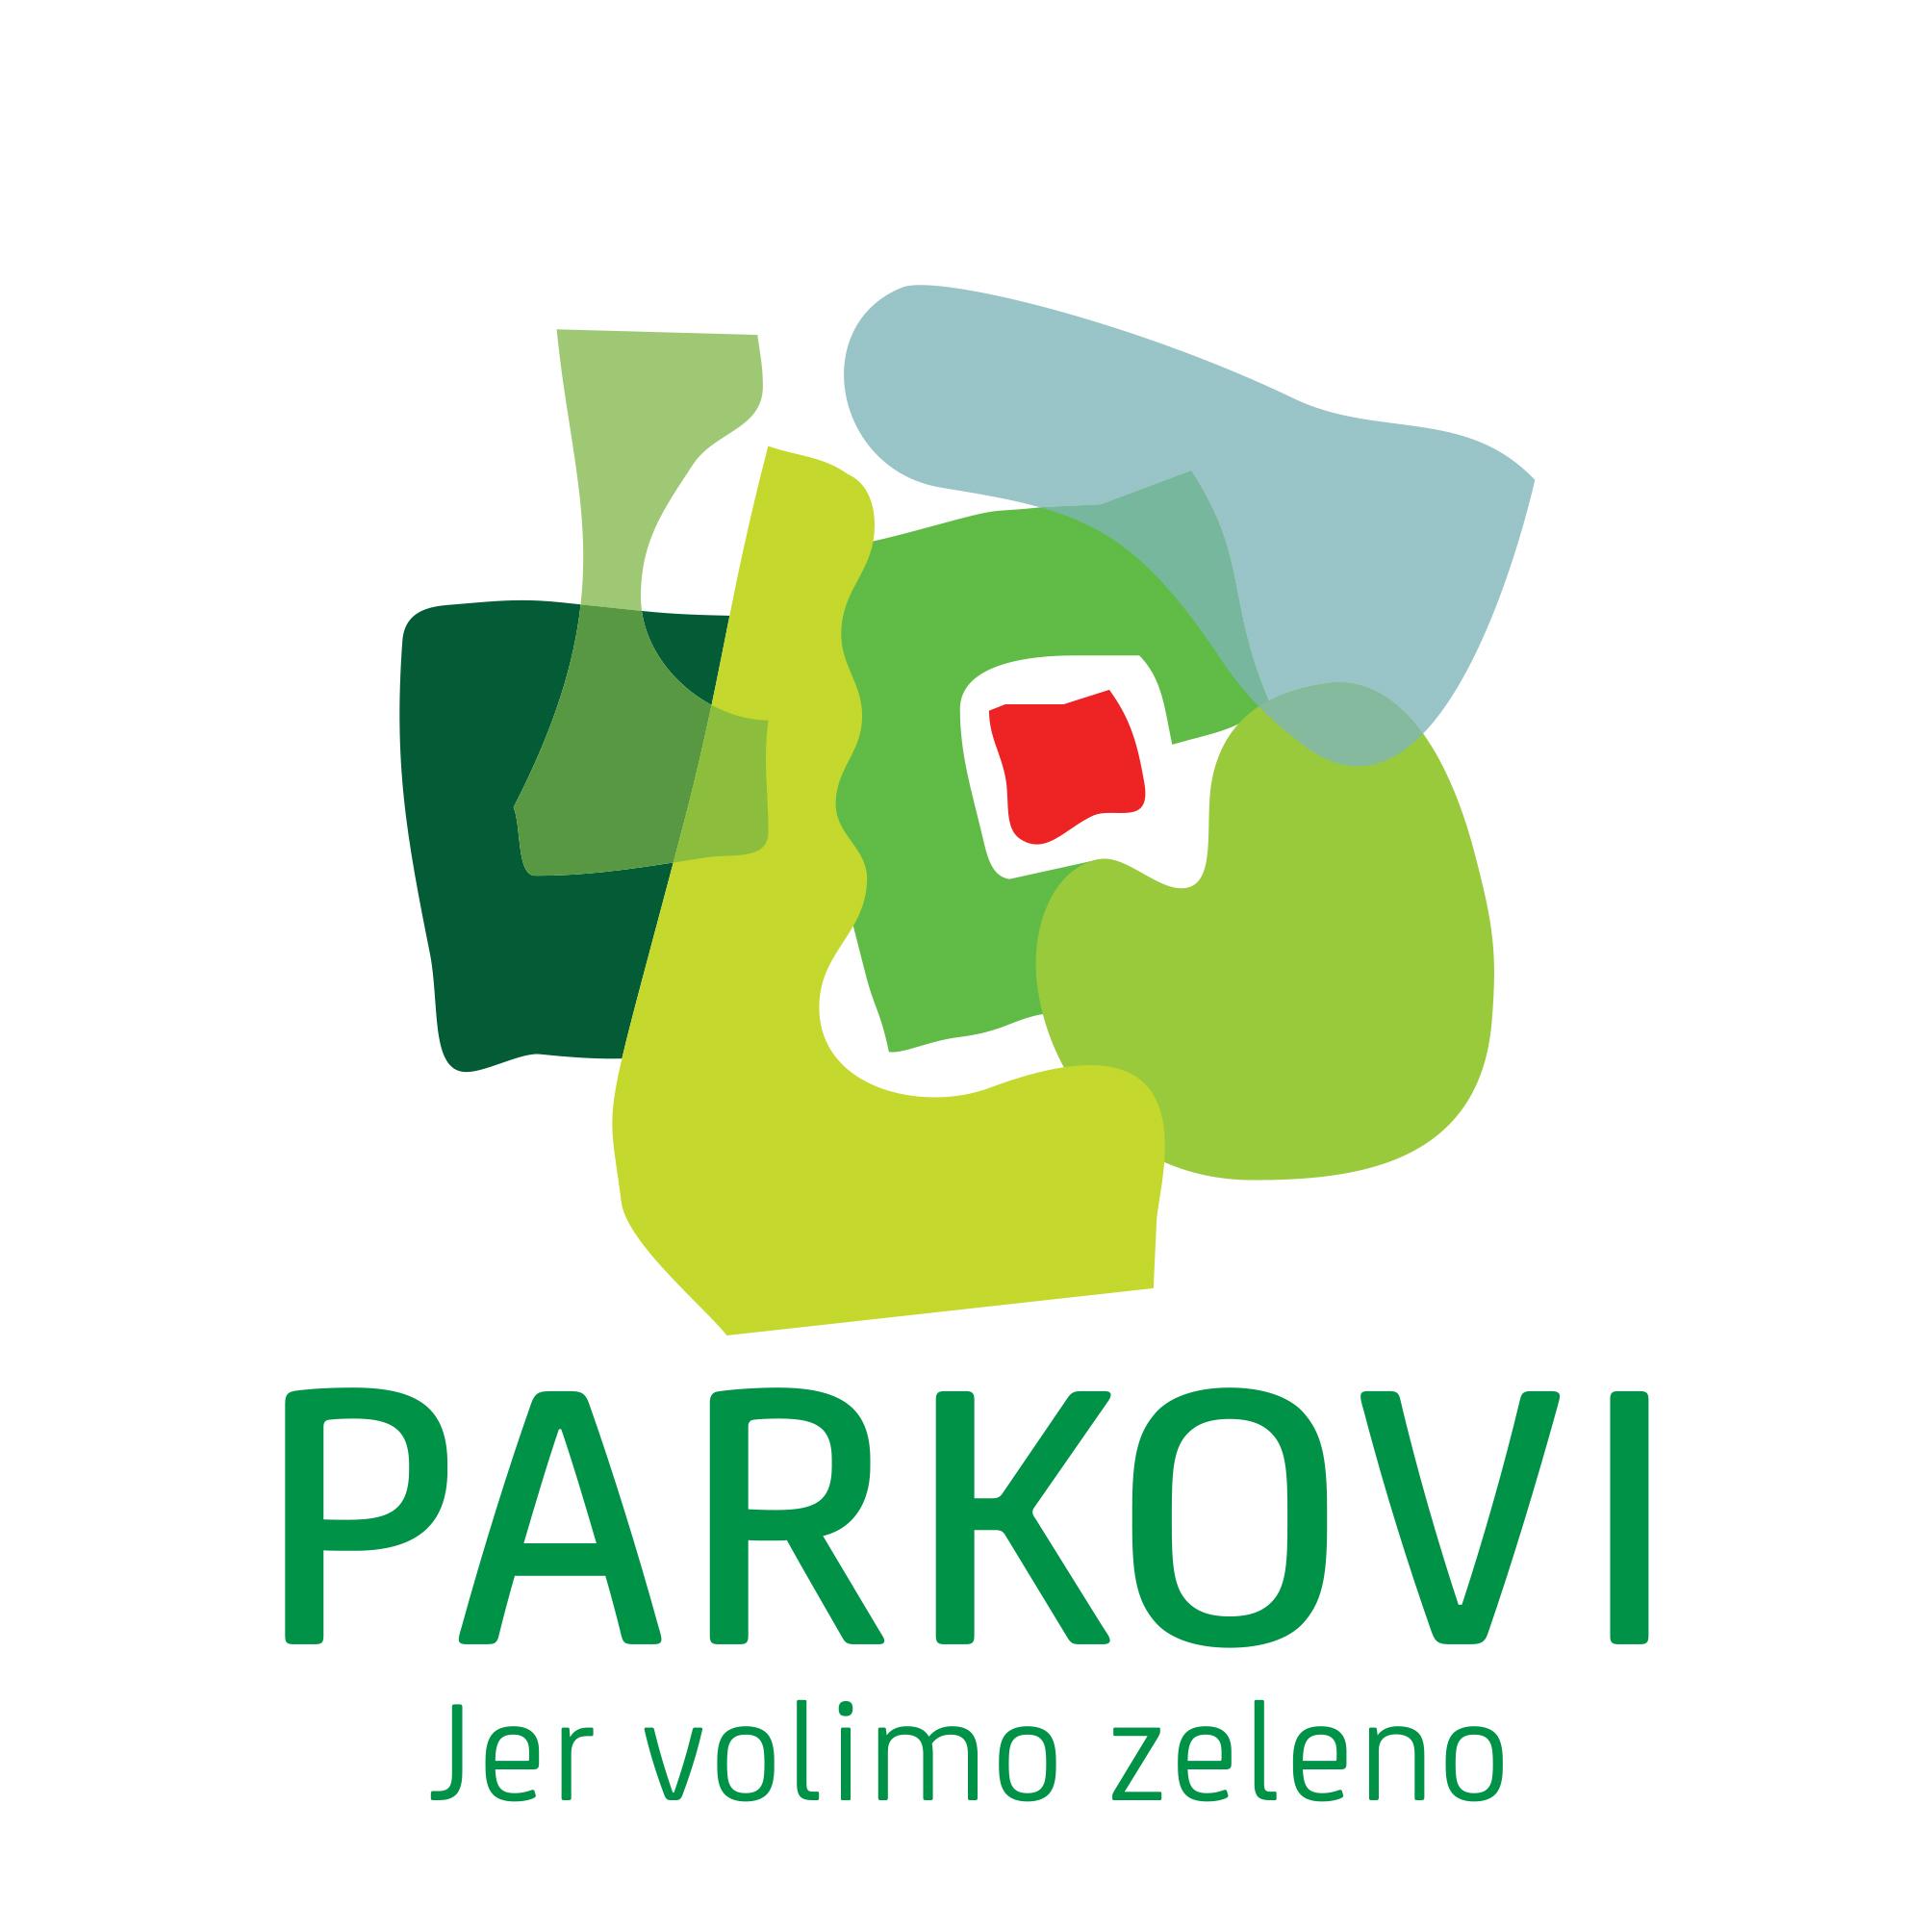 http://www.parkovi.com/